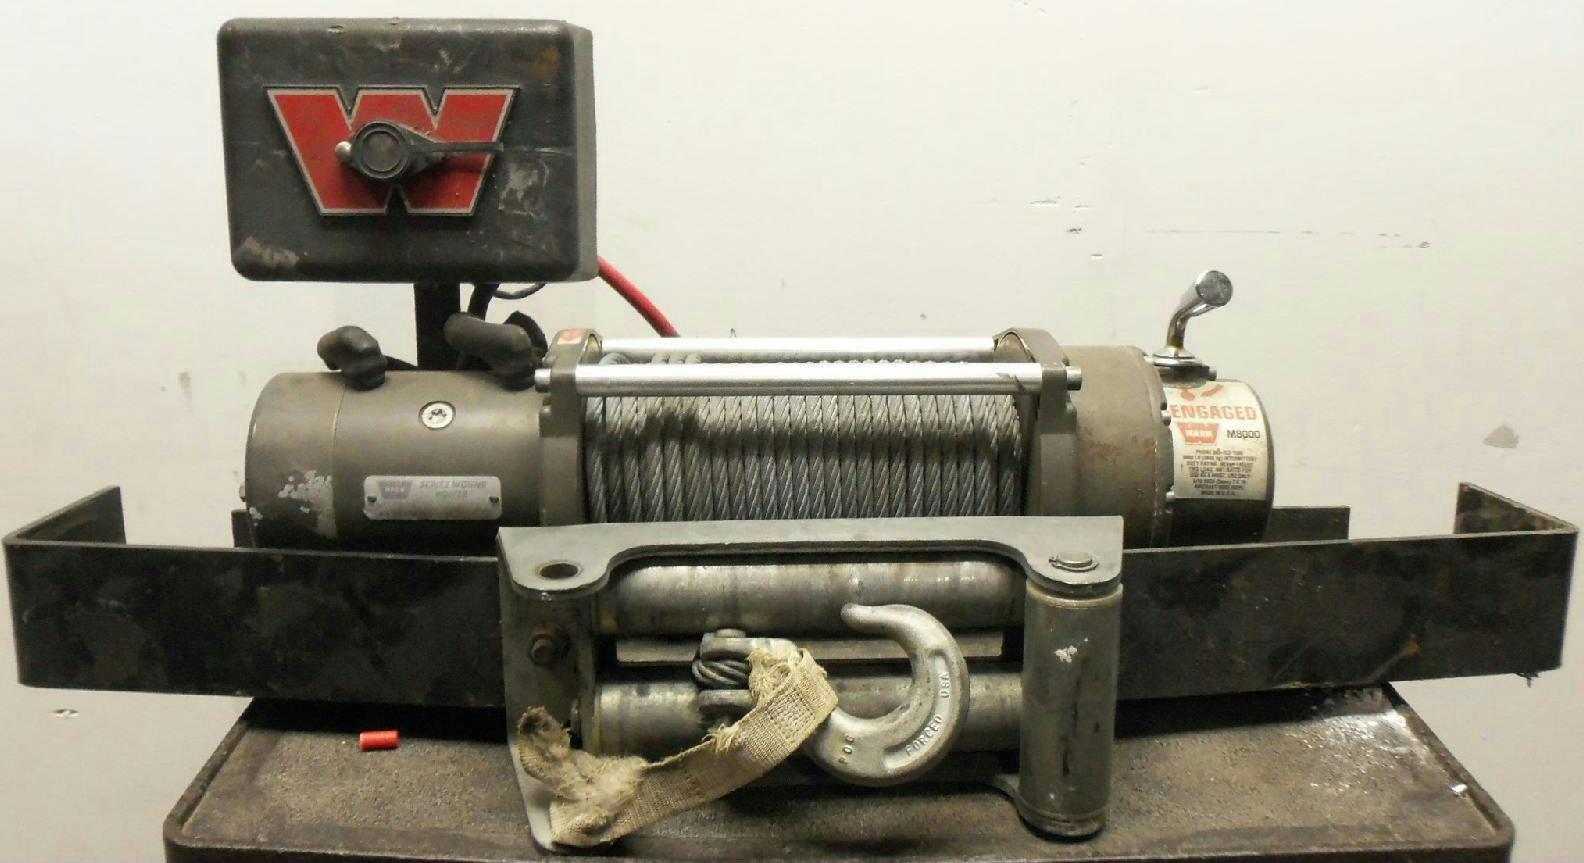 warn winch wiring diagram xd9000i tvs fiero f2 model 25314